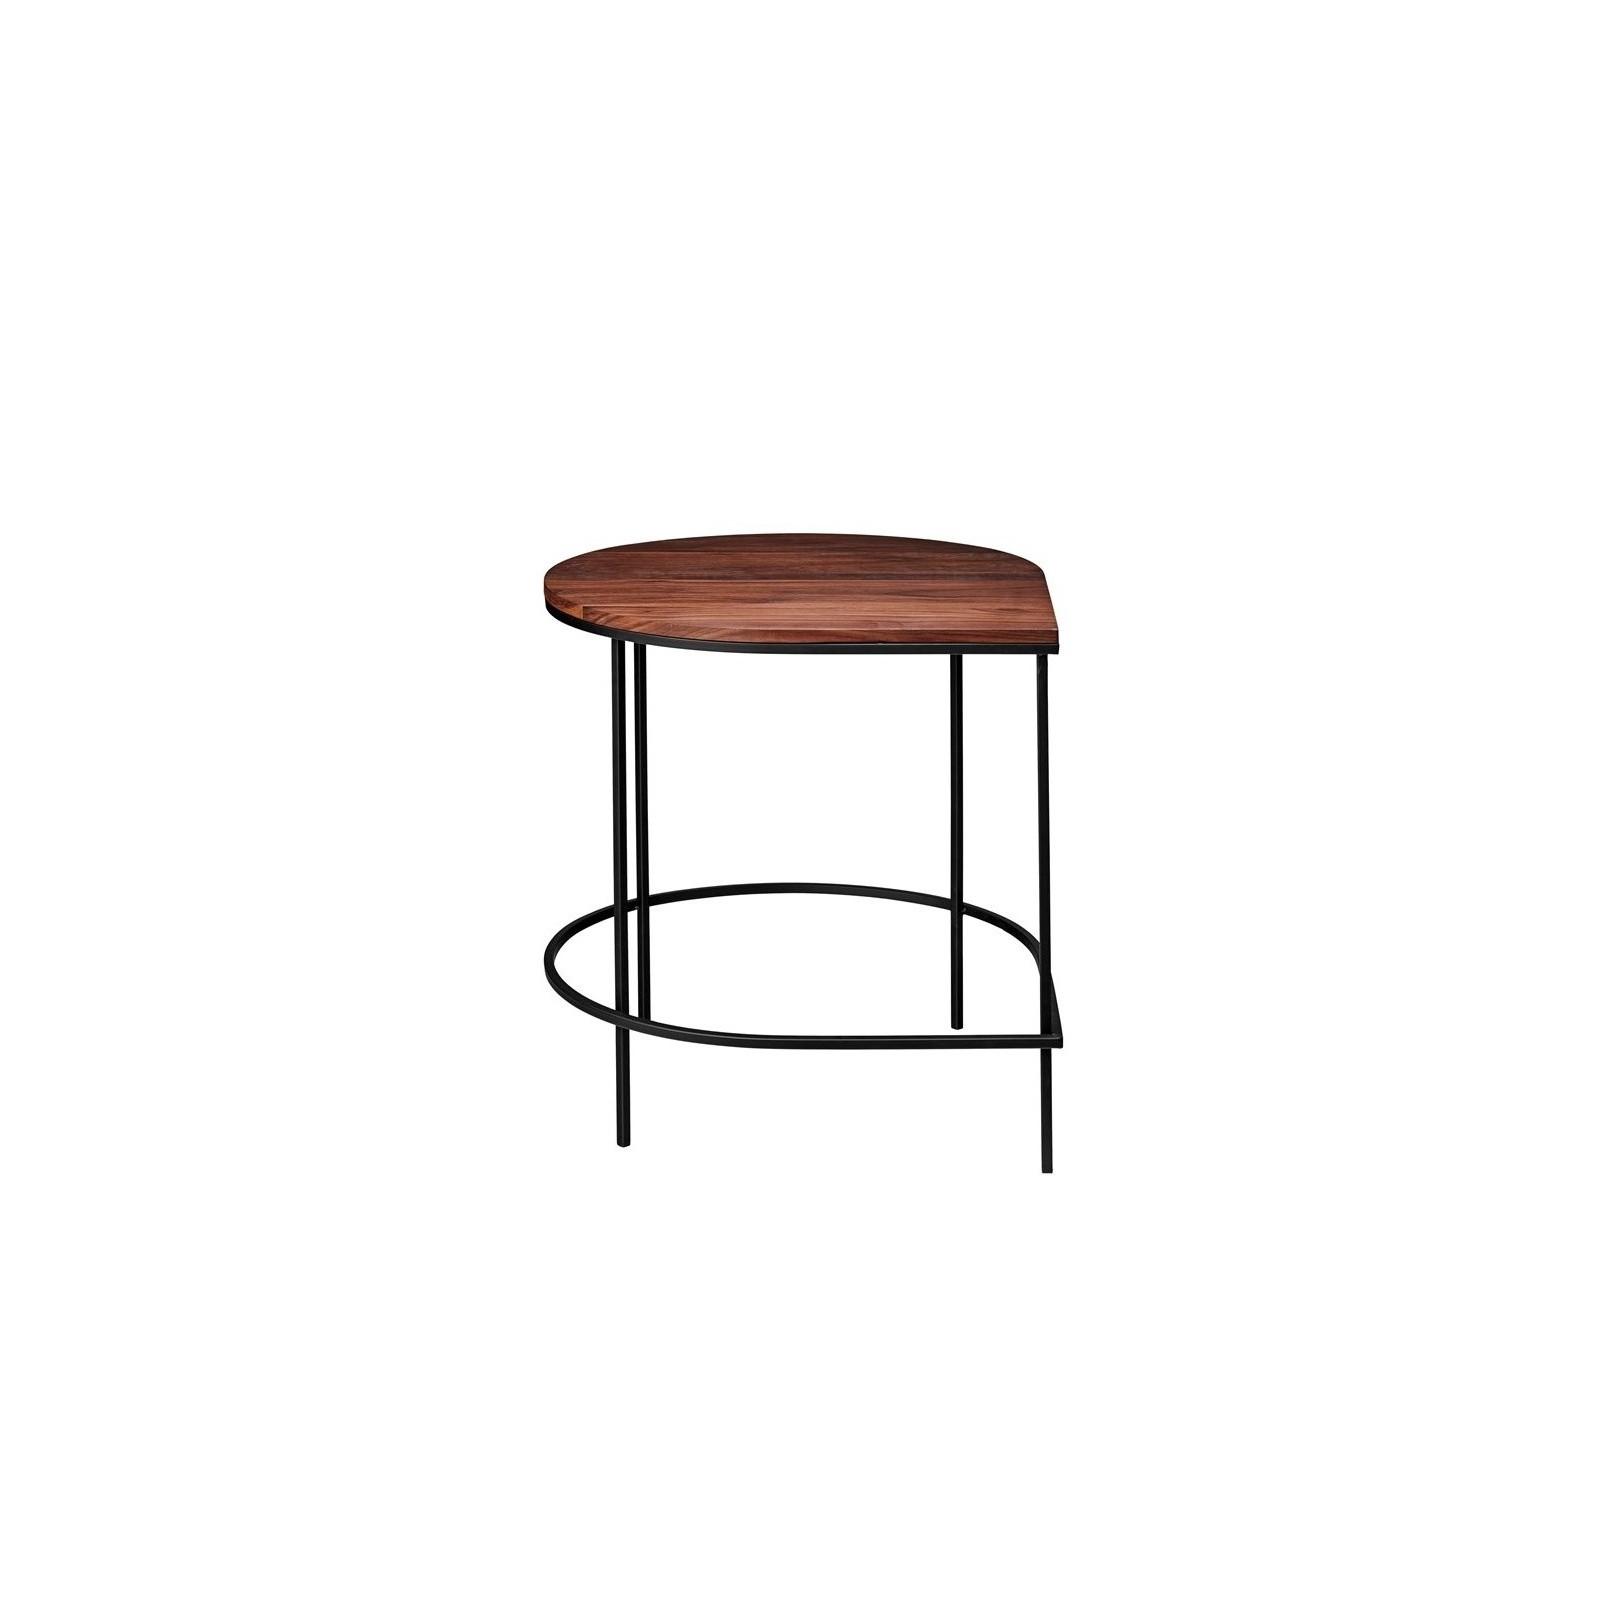 table goutte plateau bois arne concept. Black Bedroom Furniture Sets. Home Design Ideas